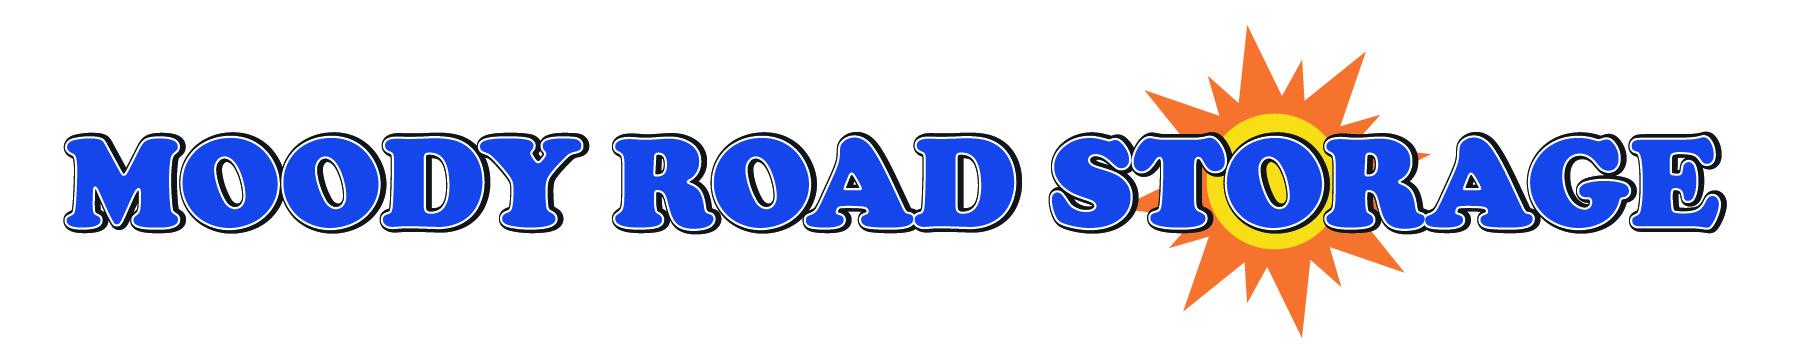 Moody Road Storage